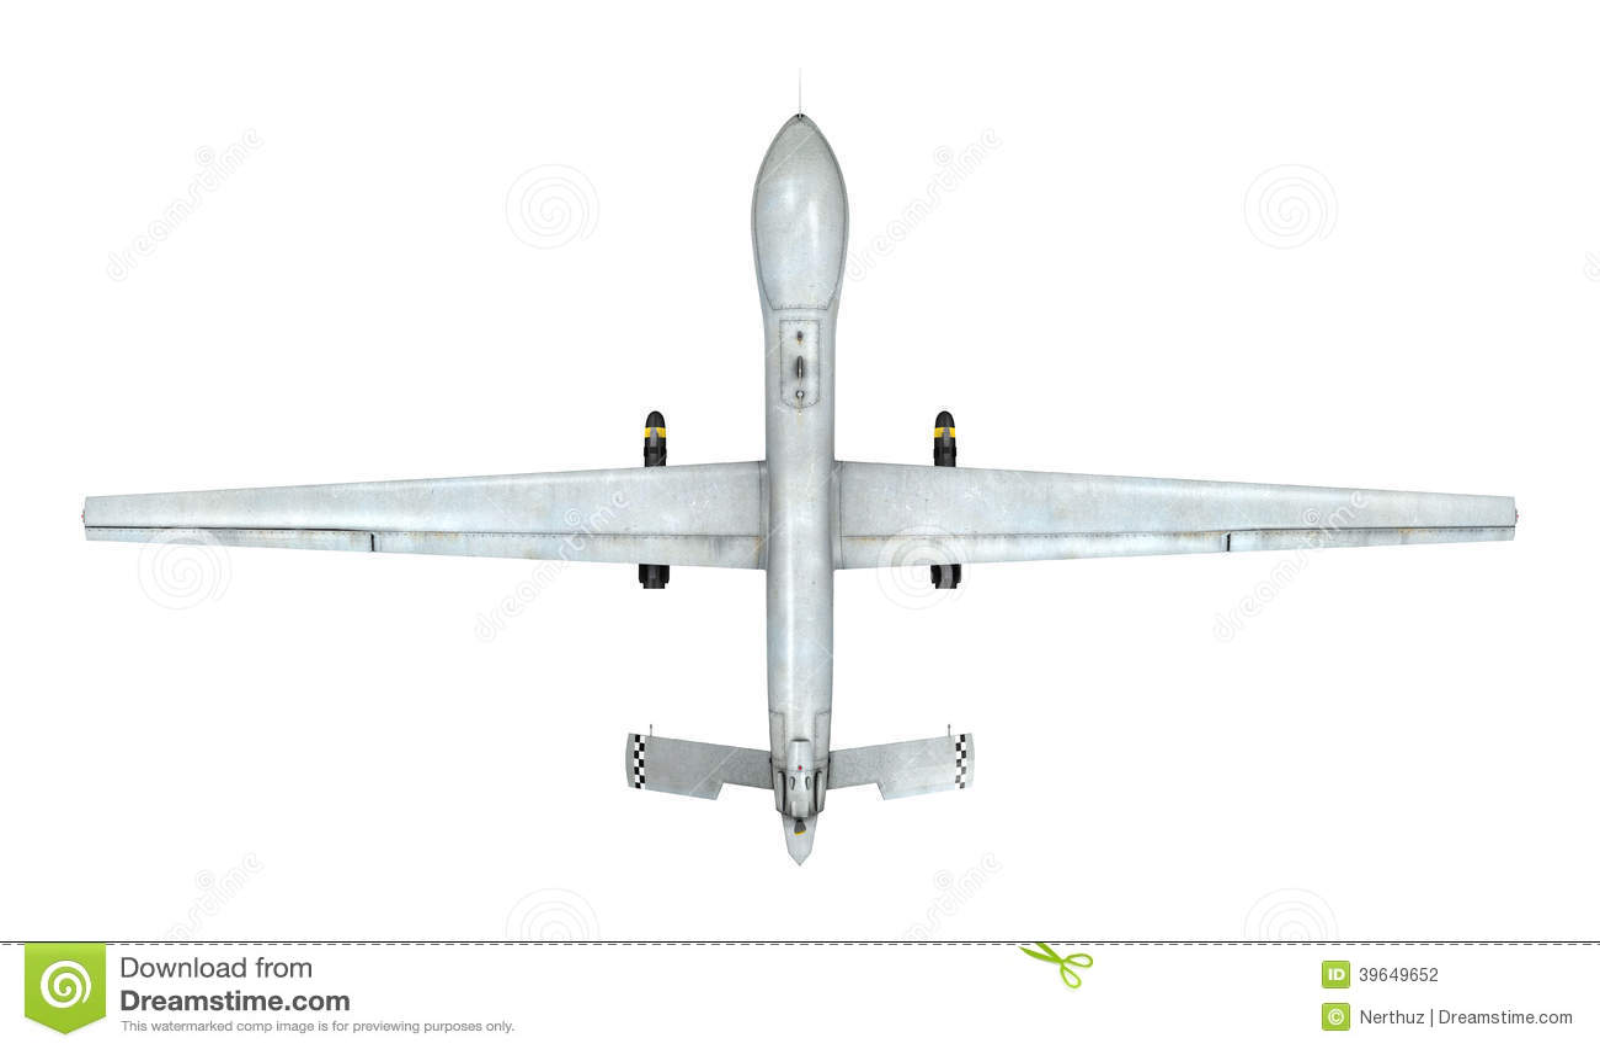 military predator drone stock illustration image 39649652